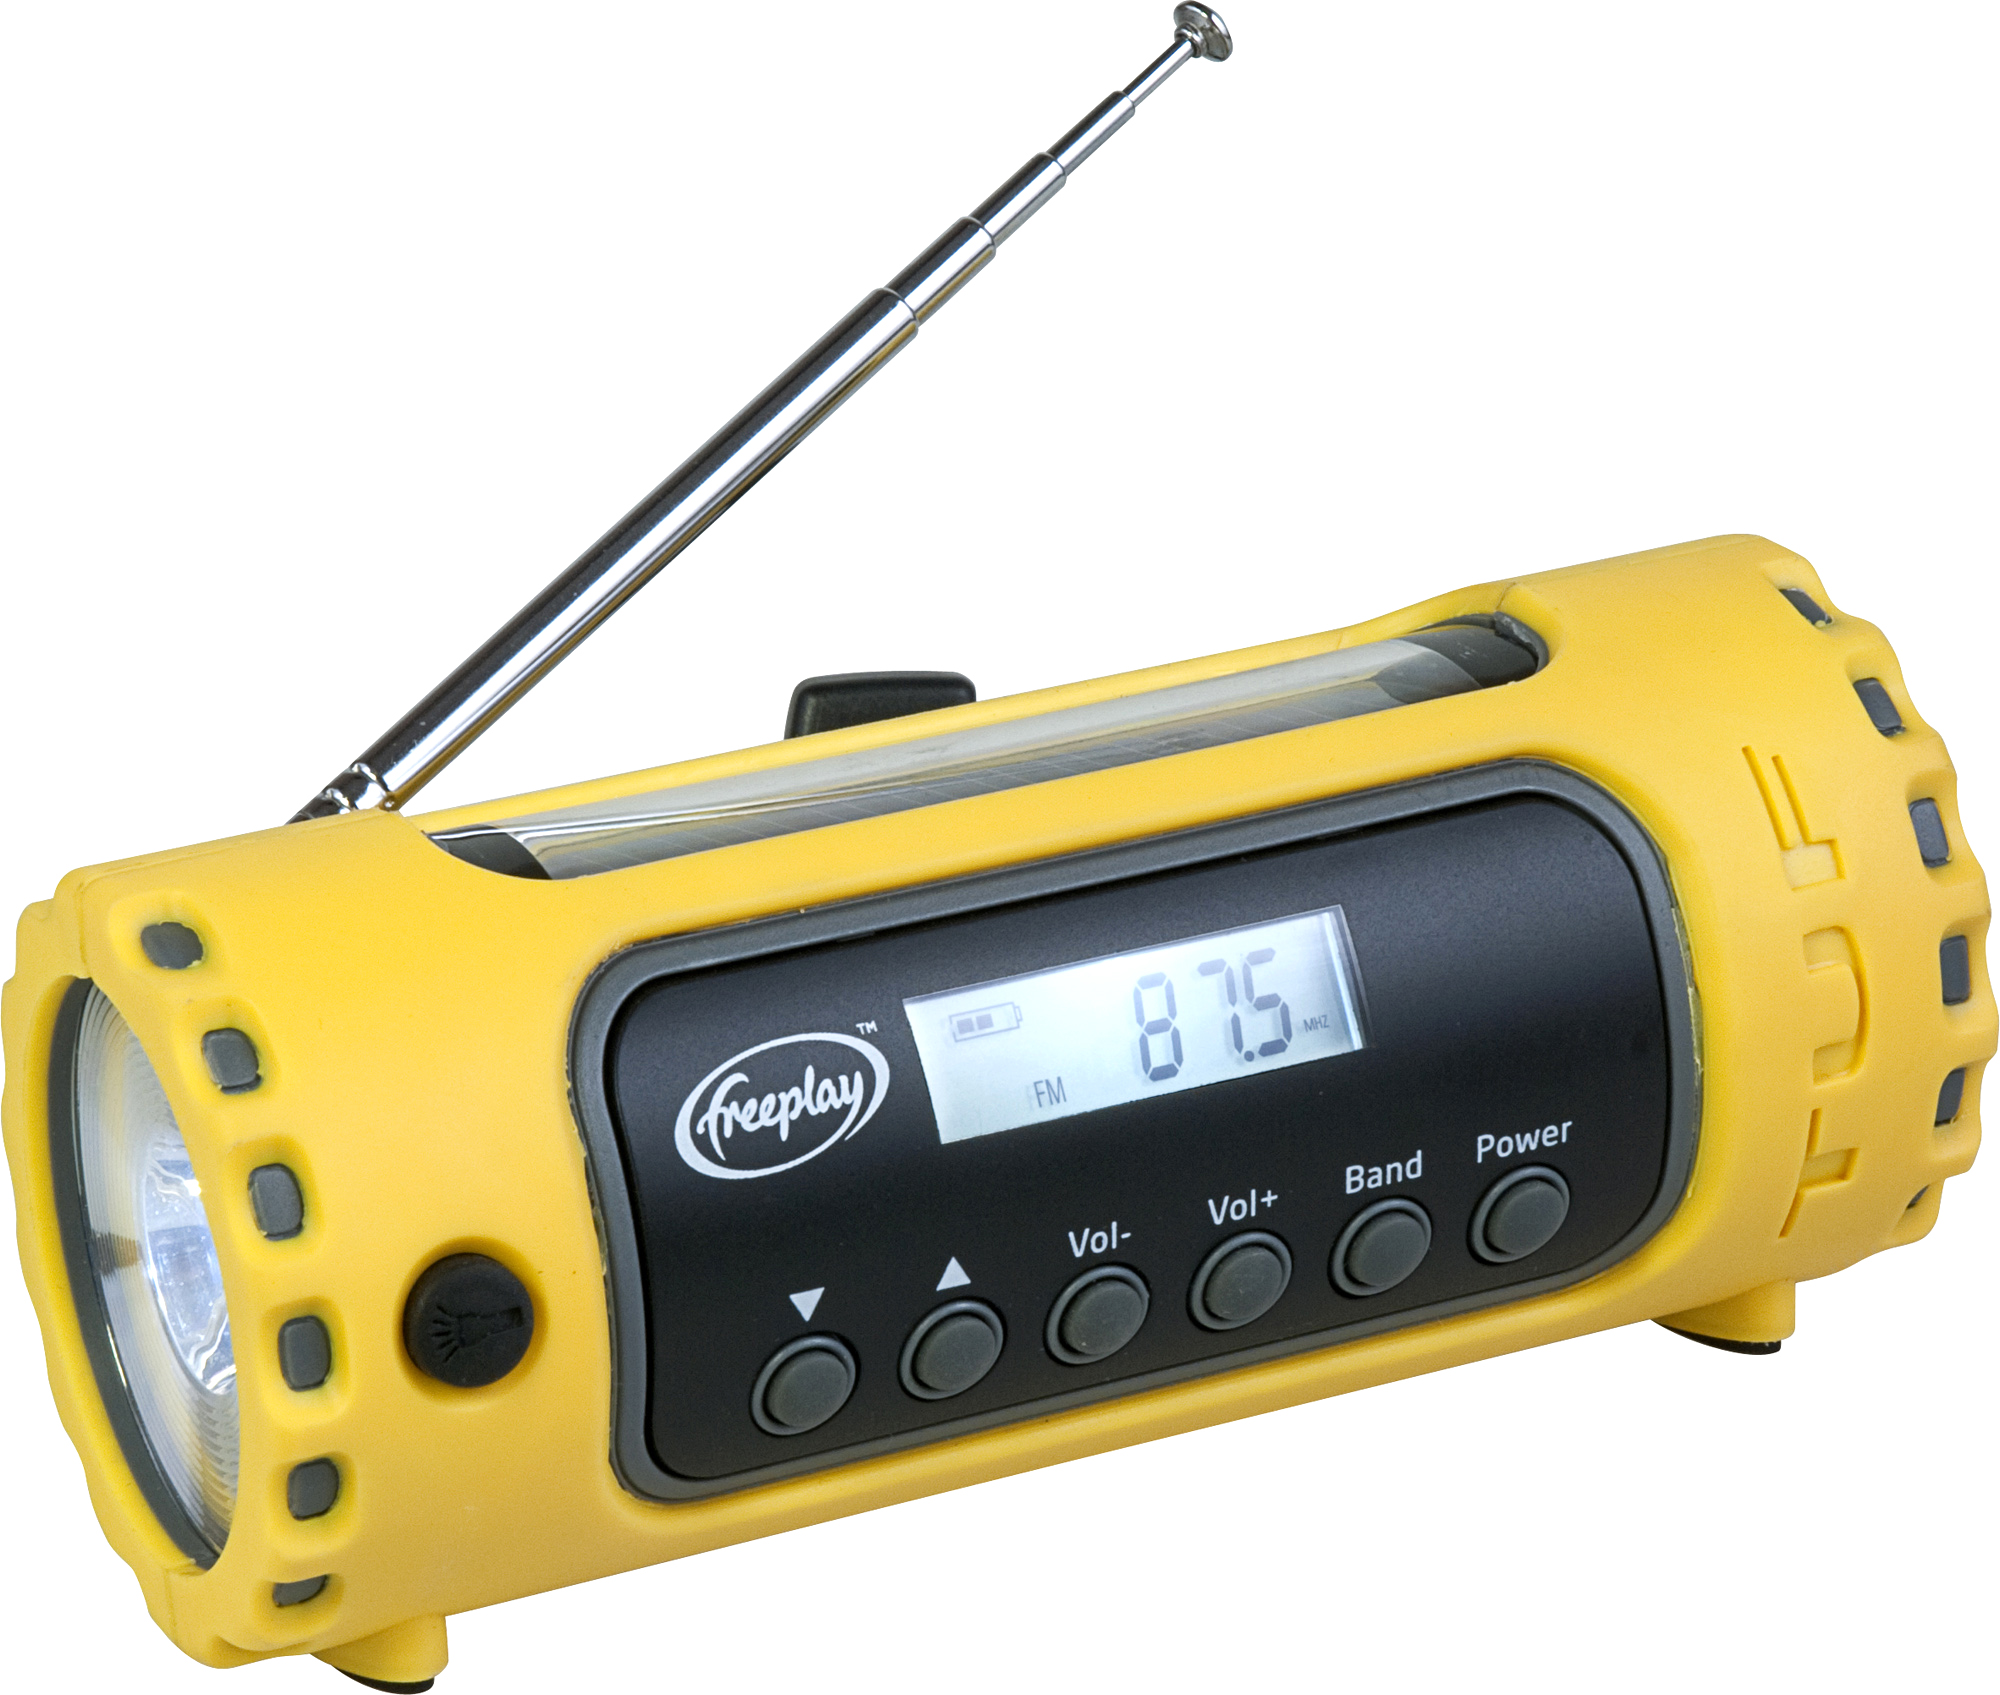 96775356d37 Freeplay TUF USB Solar Crank Emergency Radio